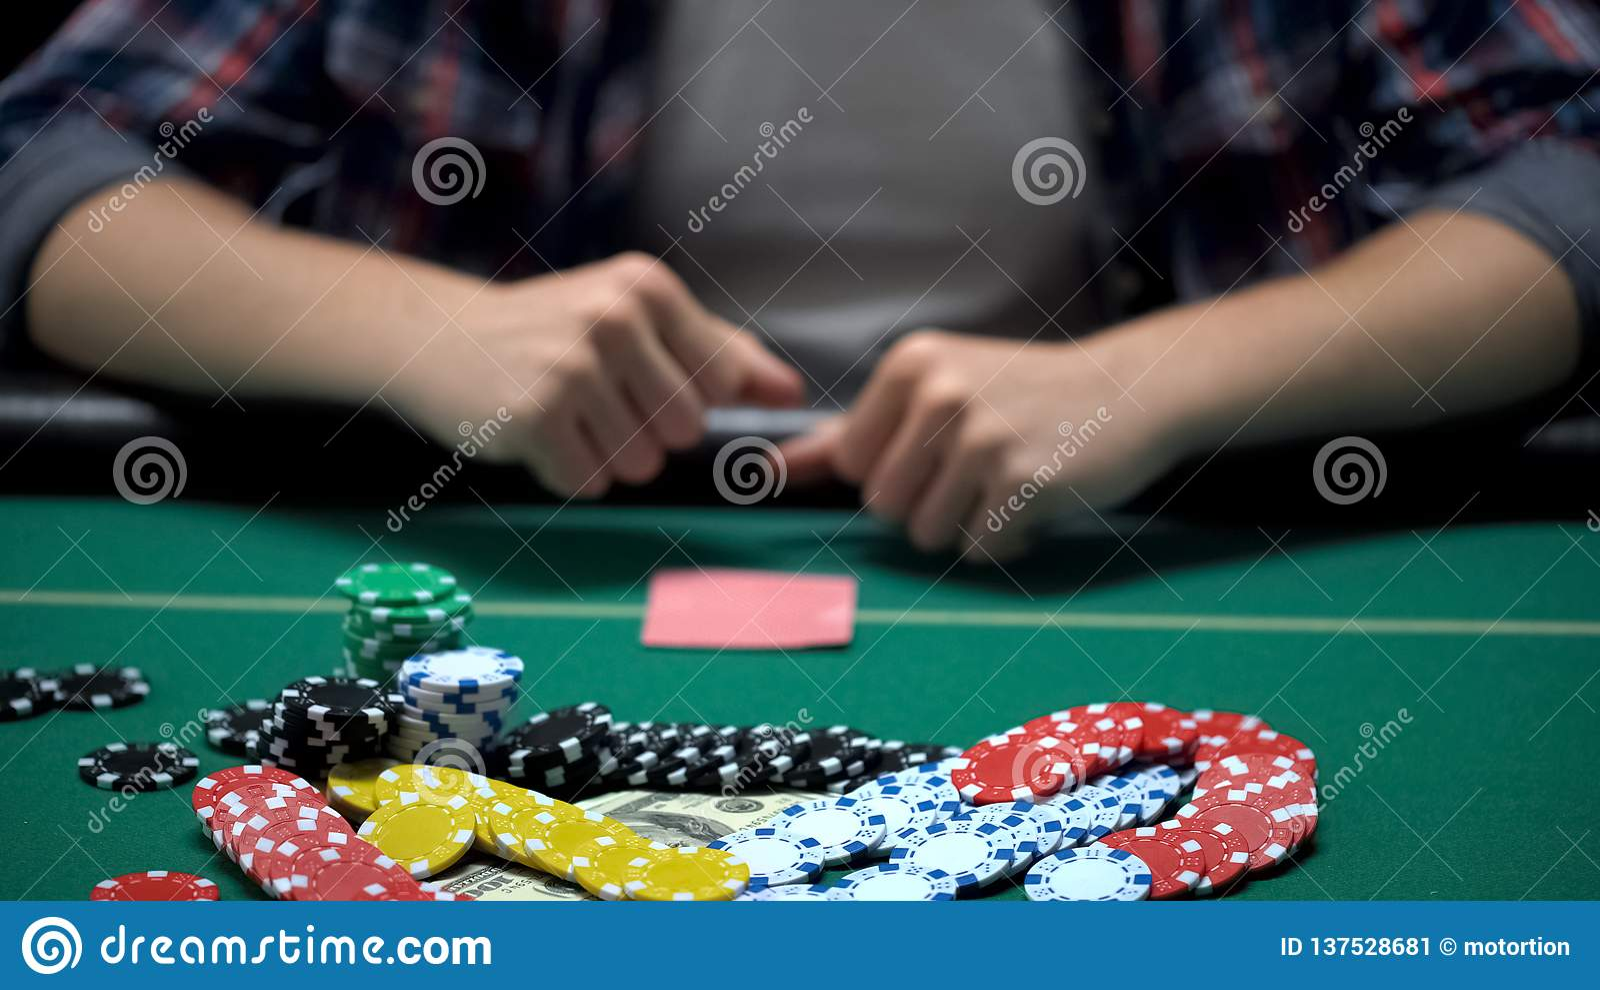 handshake gambling games